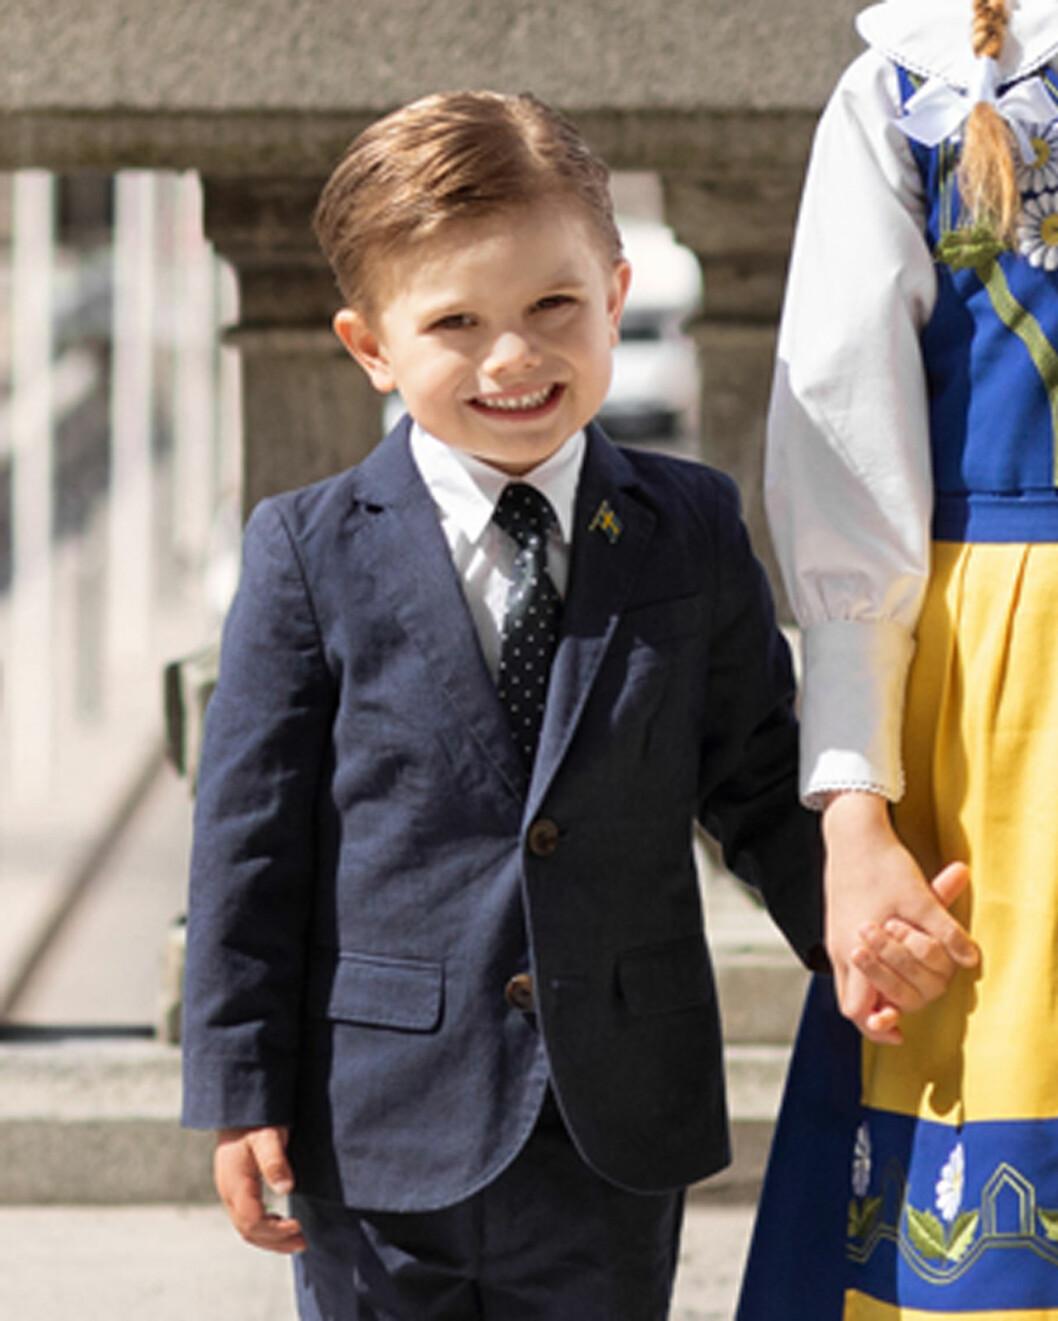 Prins Oscar får dra på sig kostymen igen.